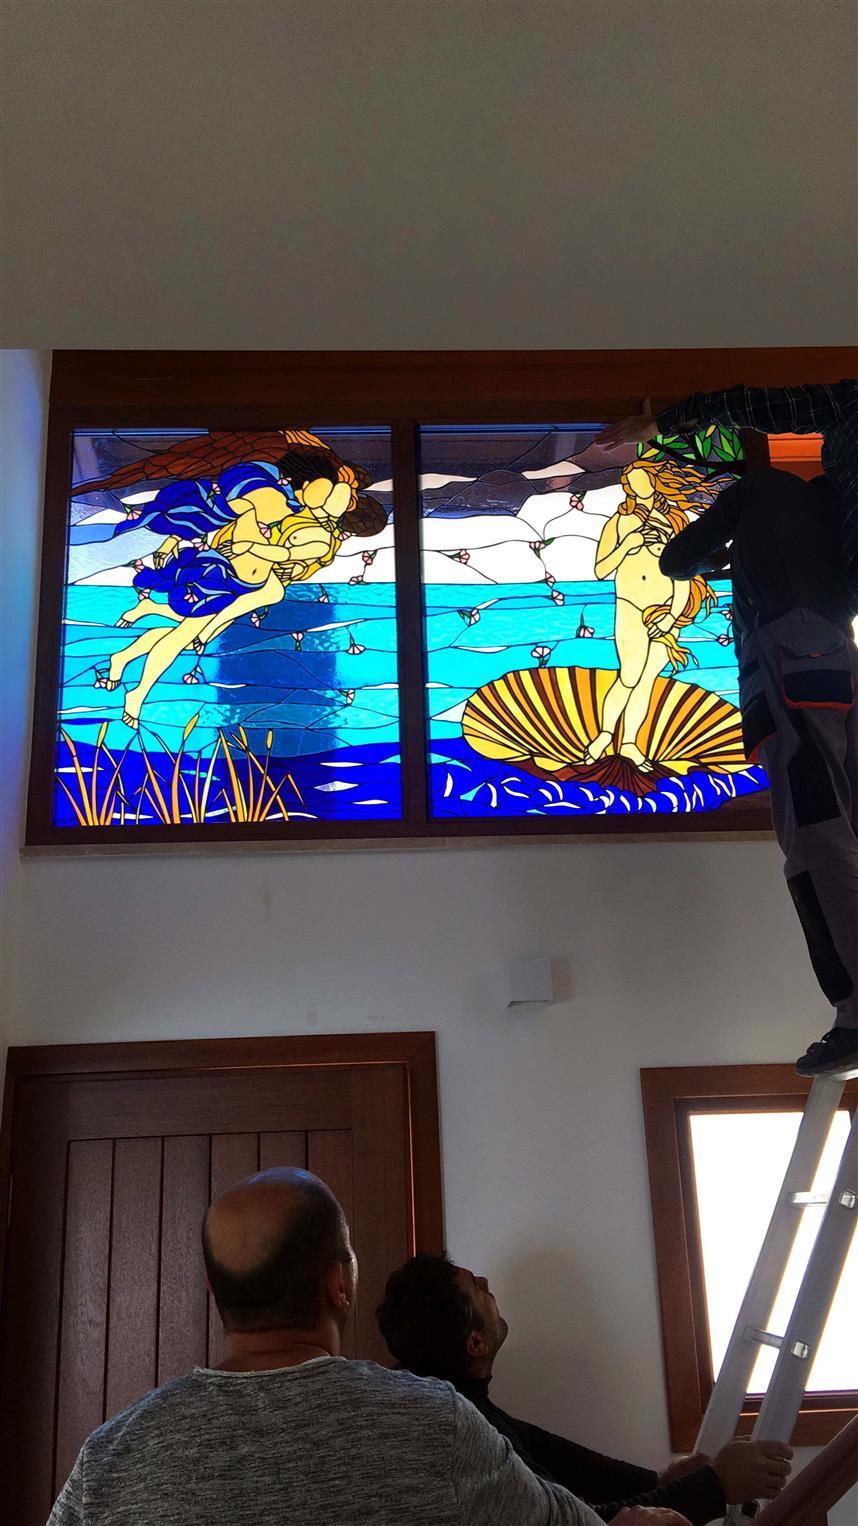 venusun-dogusu-sandro-botticelli-vitray-uyarlamasi-datca-mugla-villa2020120162316324.jpg izmir vitray çalışması